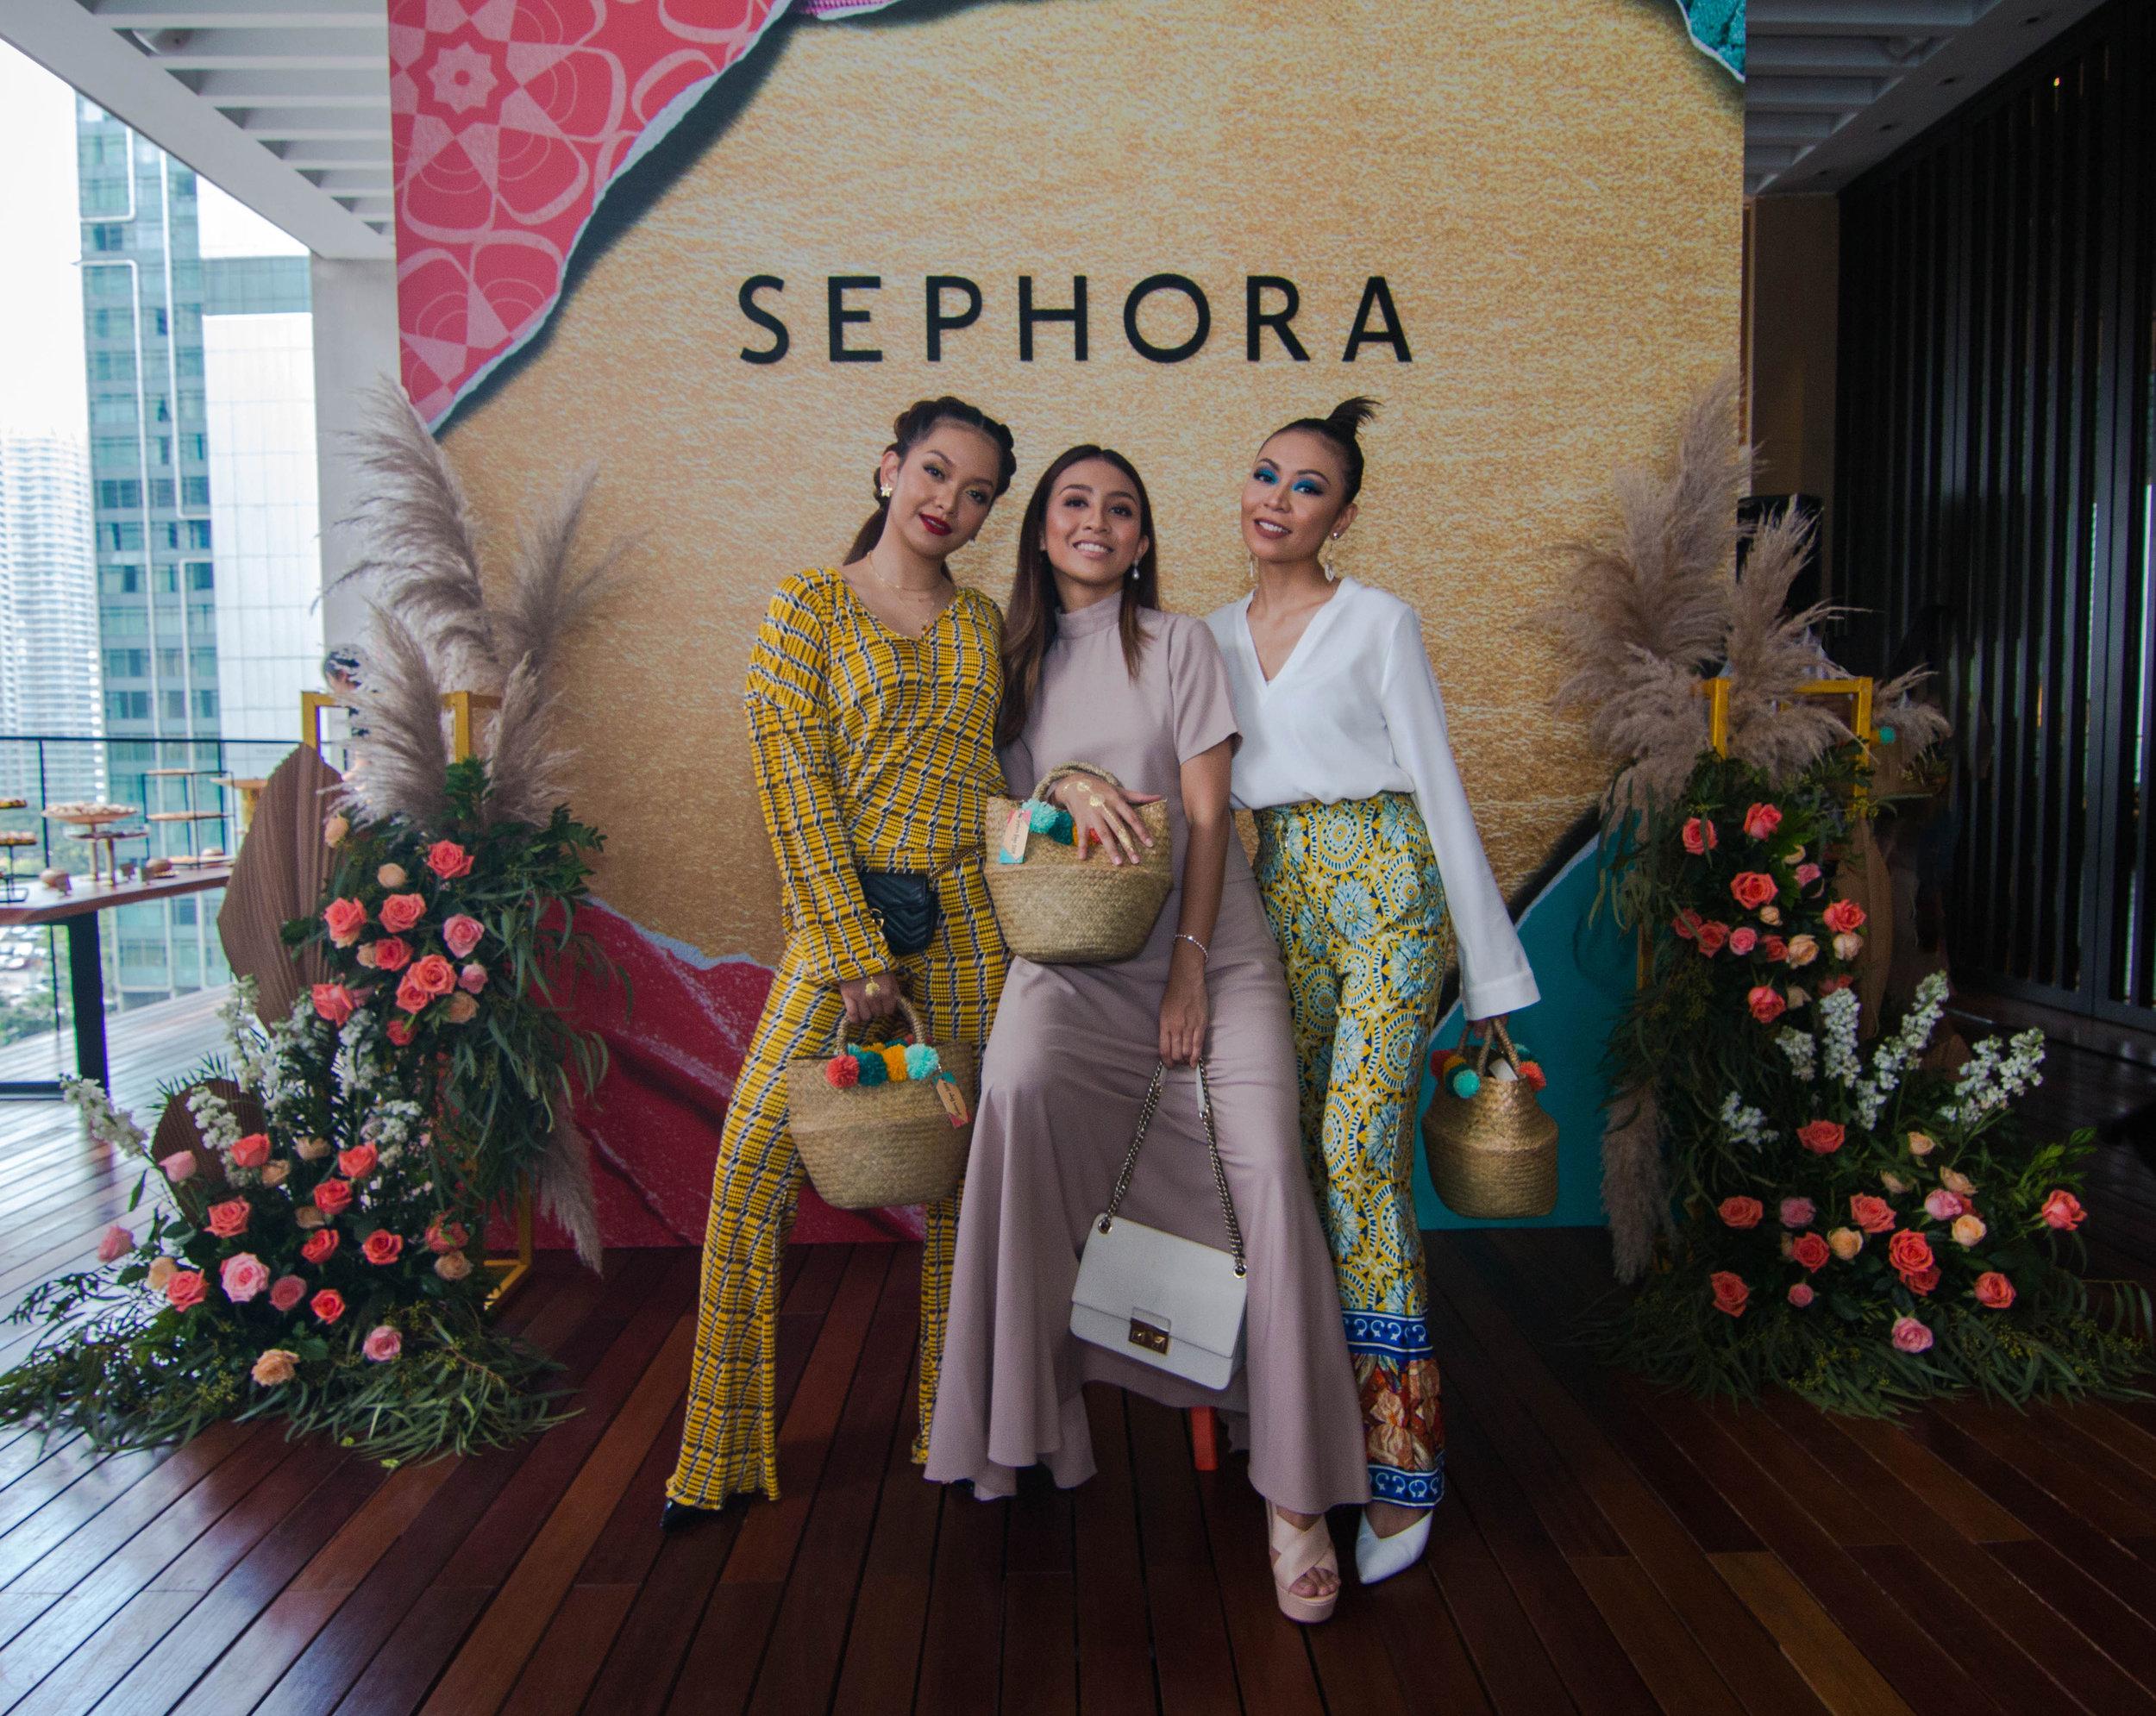 (L-R)    Azira Shafinaz   , Cik Manggis and Sophia Liana